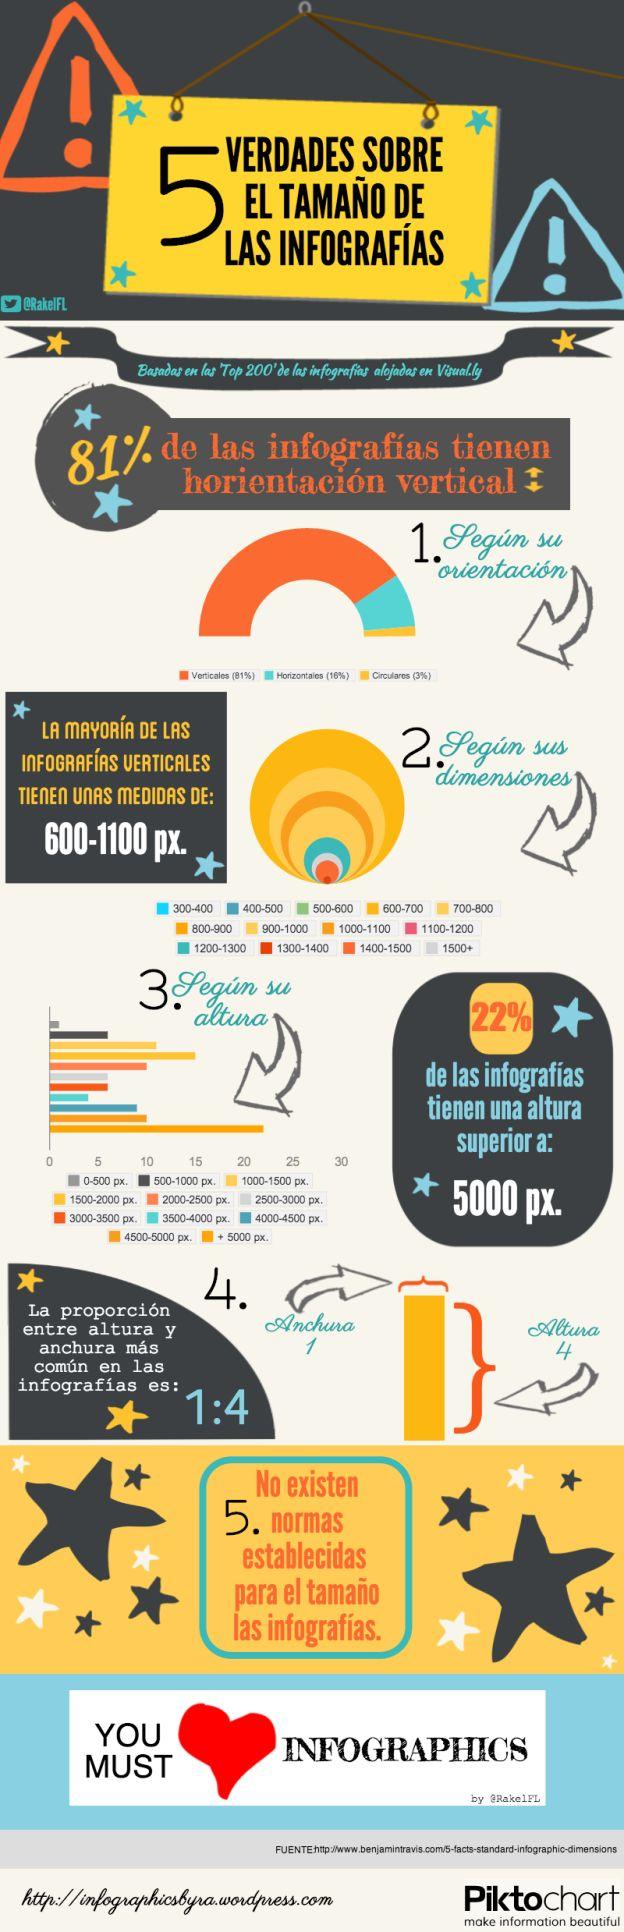 5 verdades sobre el tamaño de las infografías #infografia #infographic #design